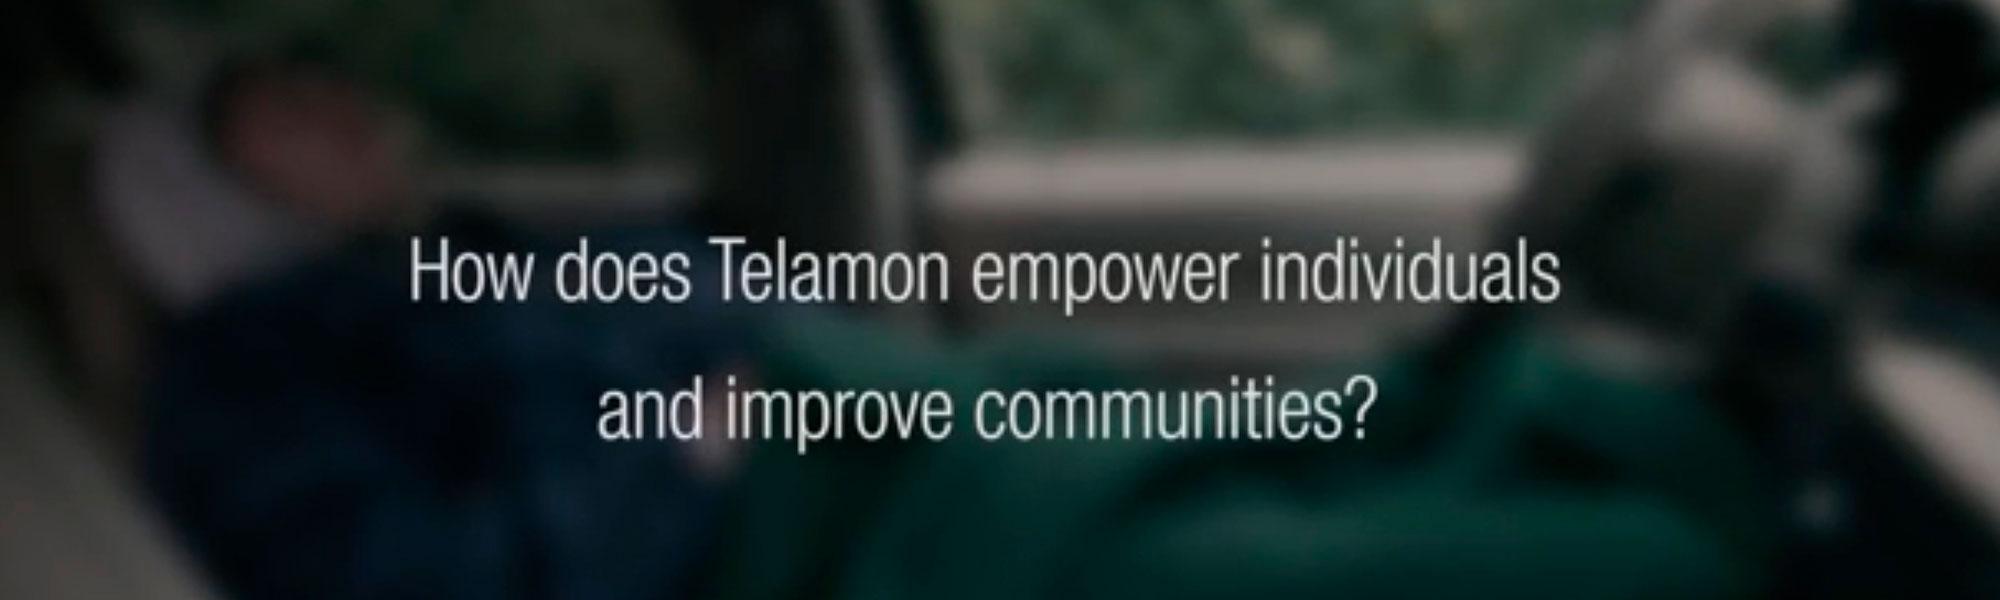 Telamon Corporation - Videos